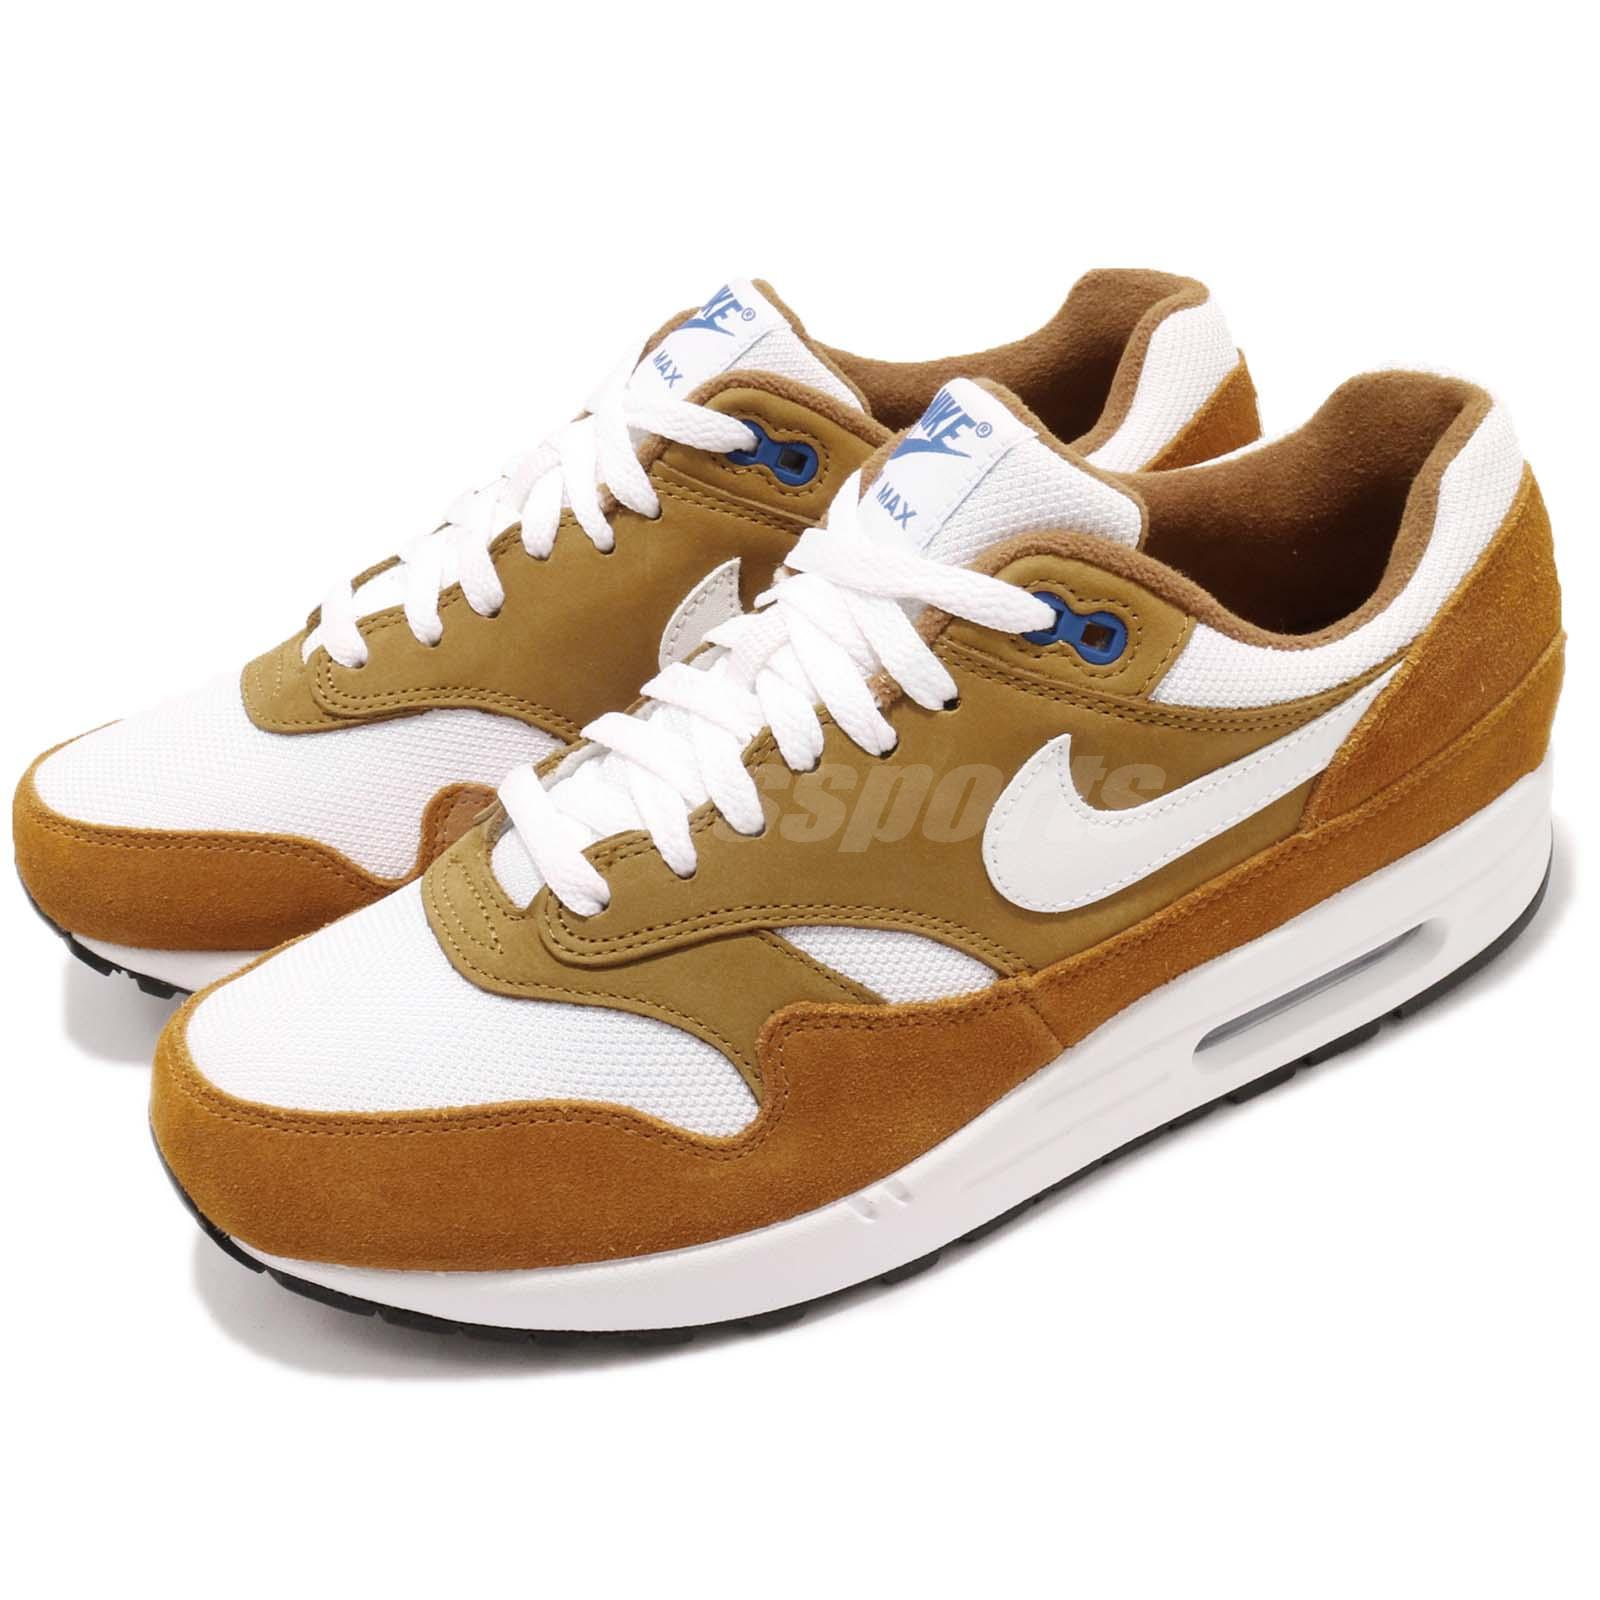 78d032fc21ba Details about Nike Air Max 1 Premium Retro I Atmos Dark Curry Men Running  Shoes 908366-700